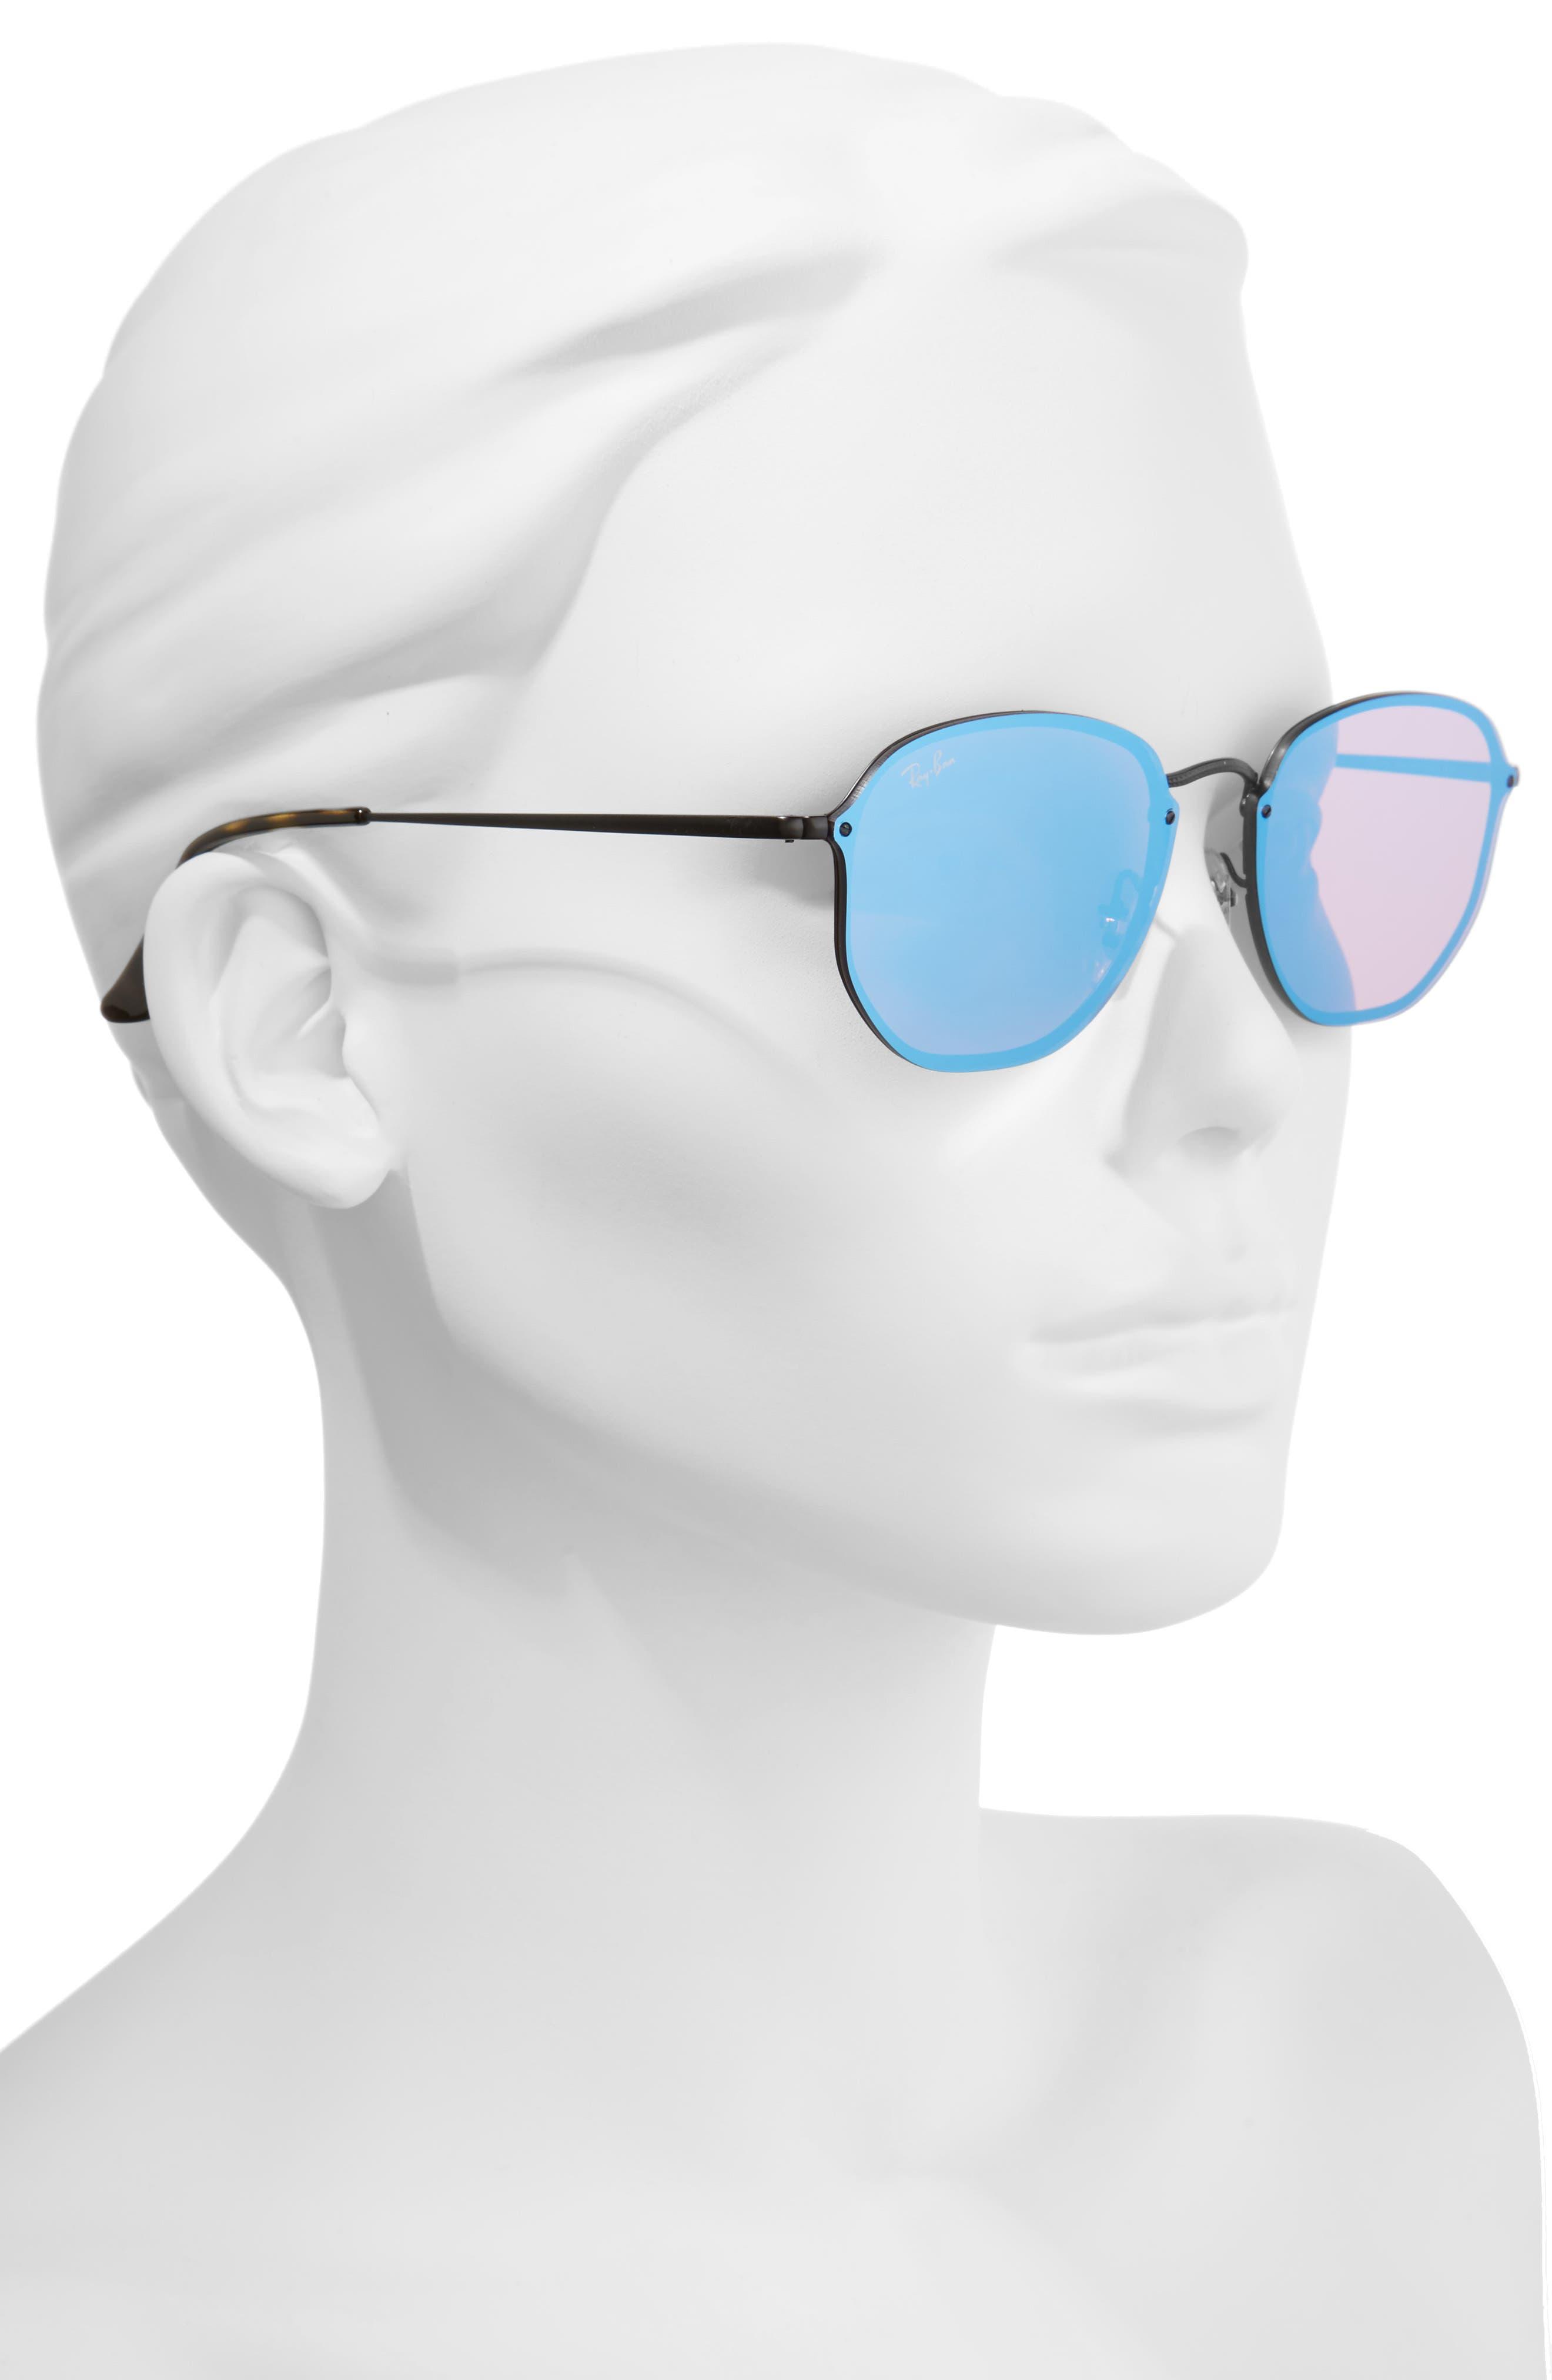 58mm Round Sunglasses,                             Alternate thumbnail 3, color,                             Shiny Black